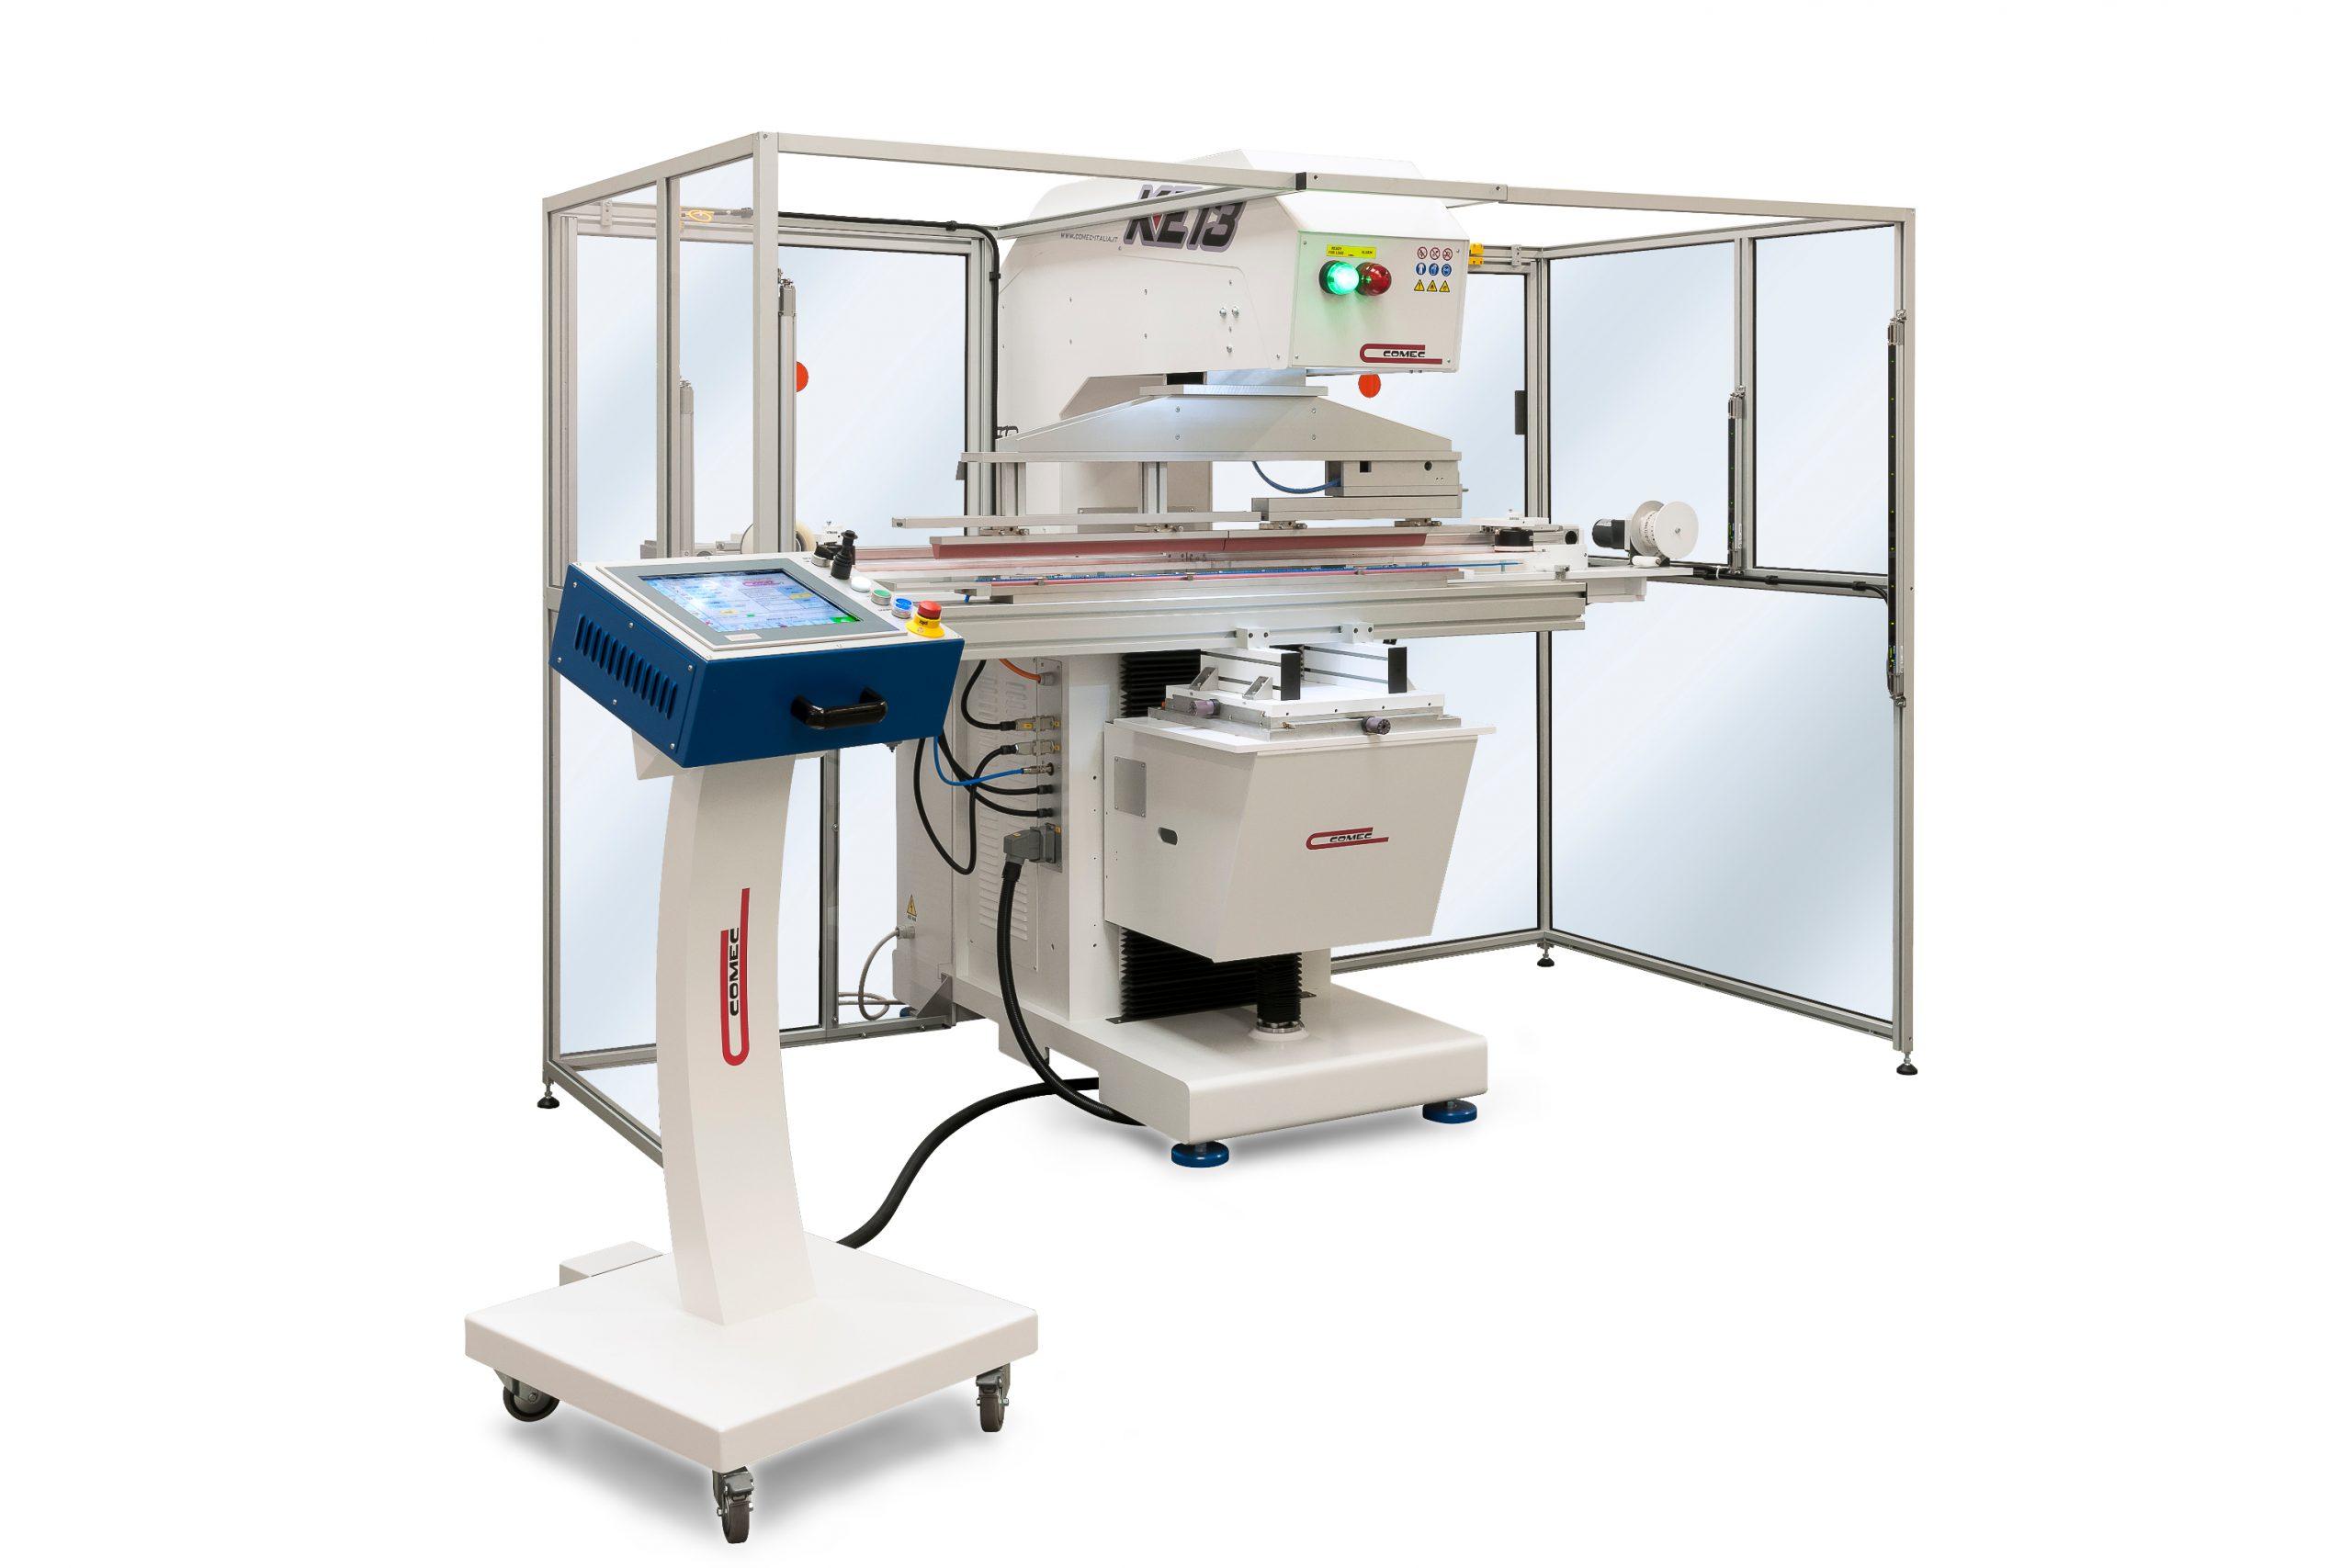 KE13_2C_RR_diam.90mm_2XSLIDE_100x900mm_360°_Catheters_modificata